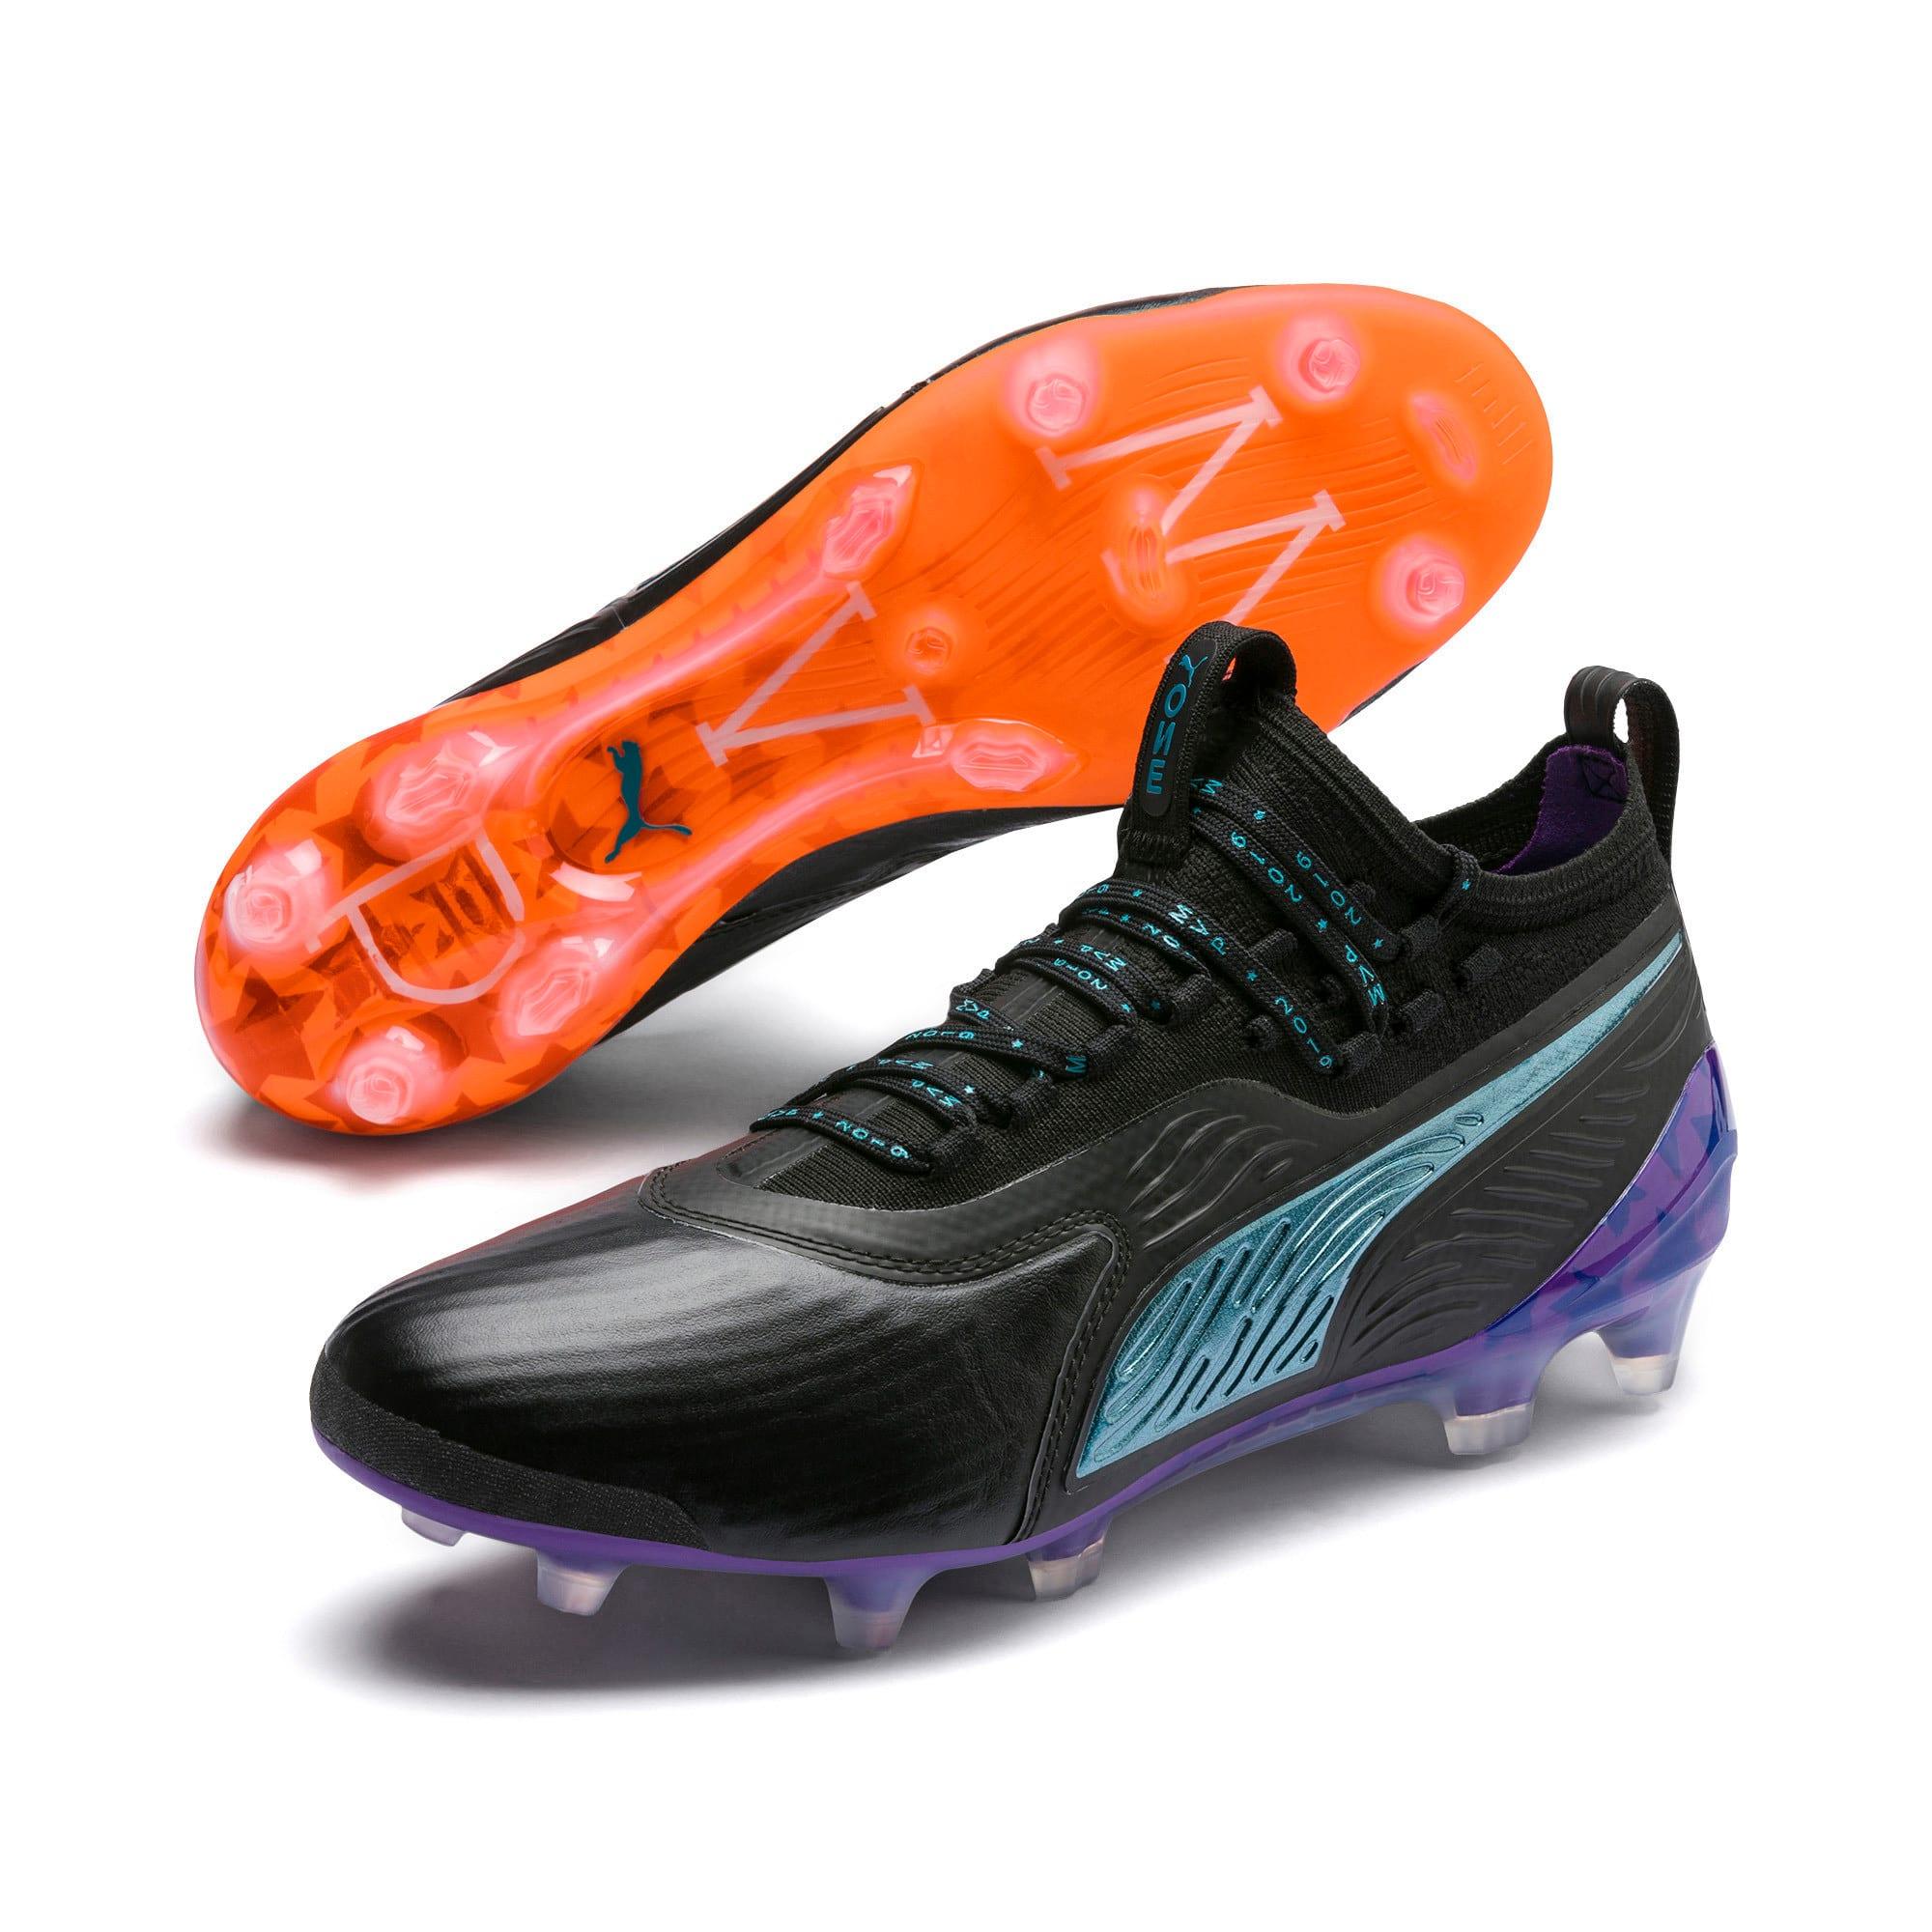 Thumbnail 2 of PUMA ONE 19.1 MVP FG/AG Men's Soccer Cleats, Black-cari sea-purple-orange, medium